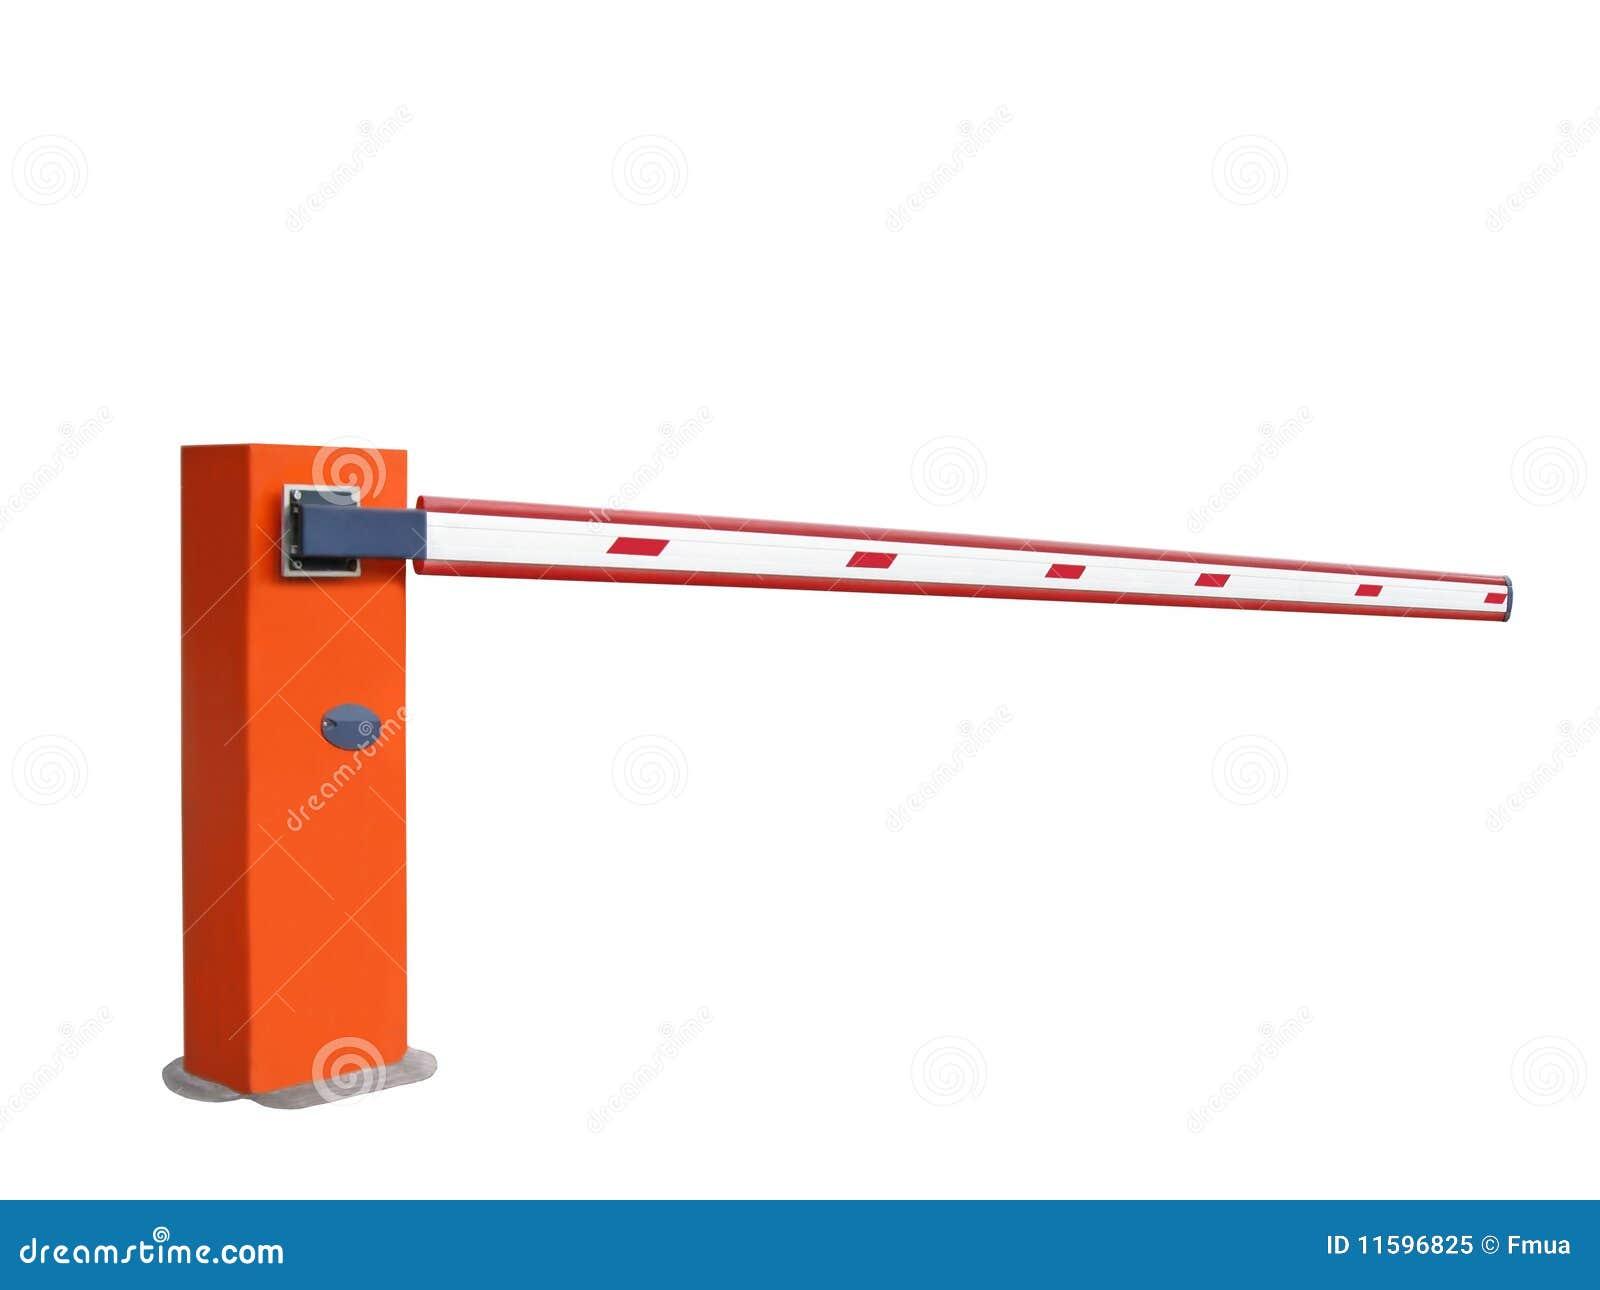 Railroad Crossing Clip Art Entr amp233e Personne clipart